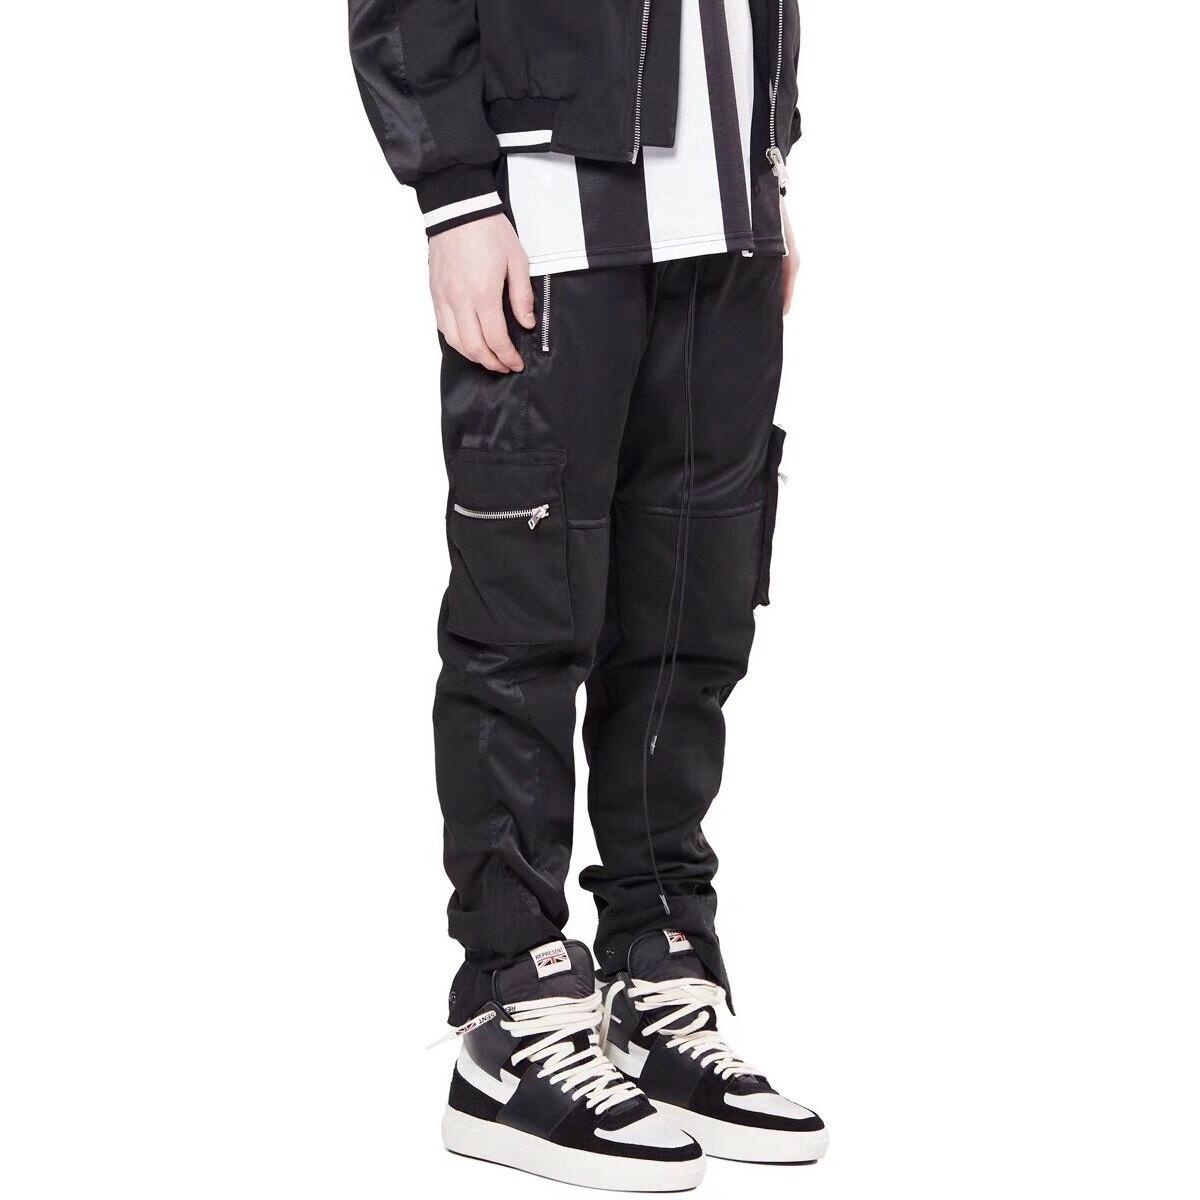 Kanye West negro función de carga pantalones de hip hop para hombres de pantalones de sudor Multi-Bolsillo de botín Cargo para correr Pantalones